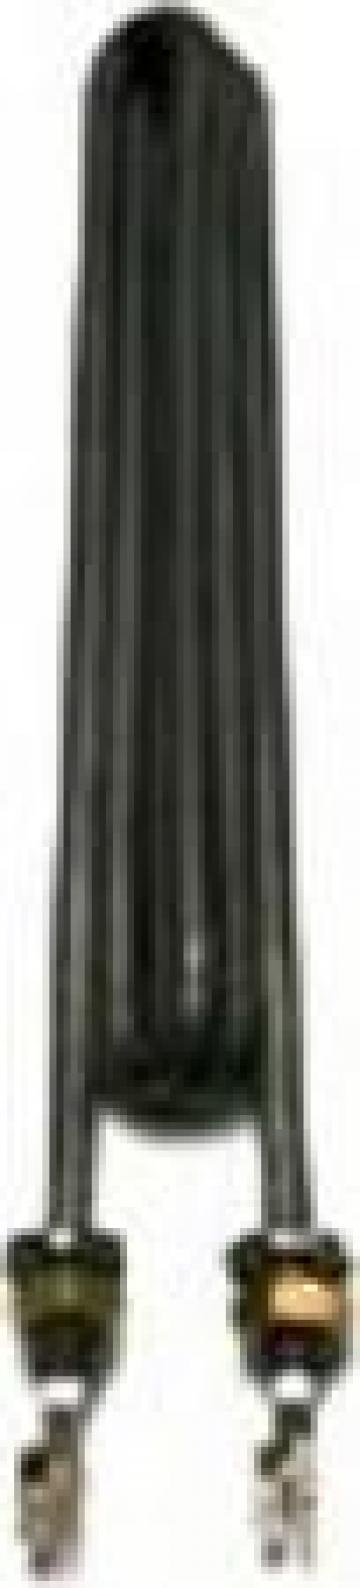 Rezistenta M10, 190mm, 1650W de la Sercotex International Srl